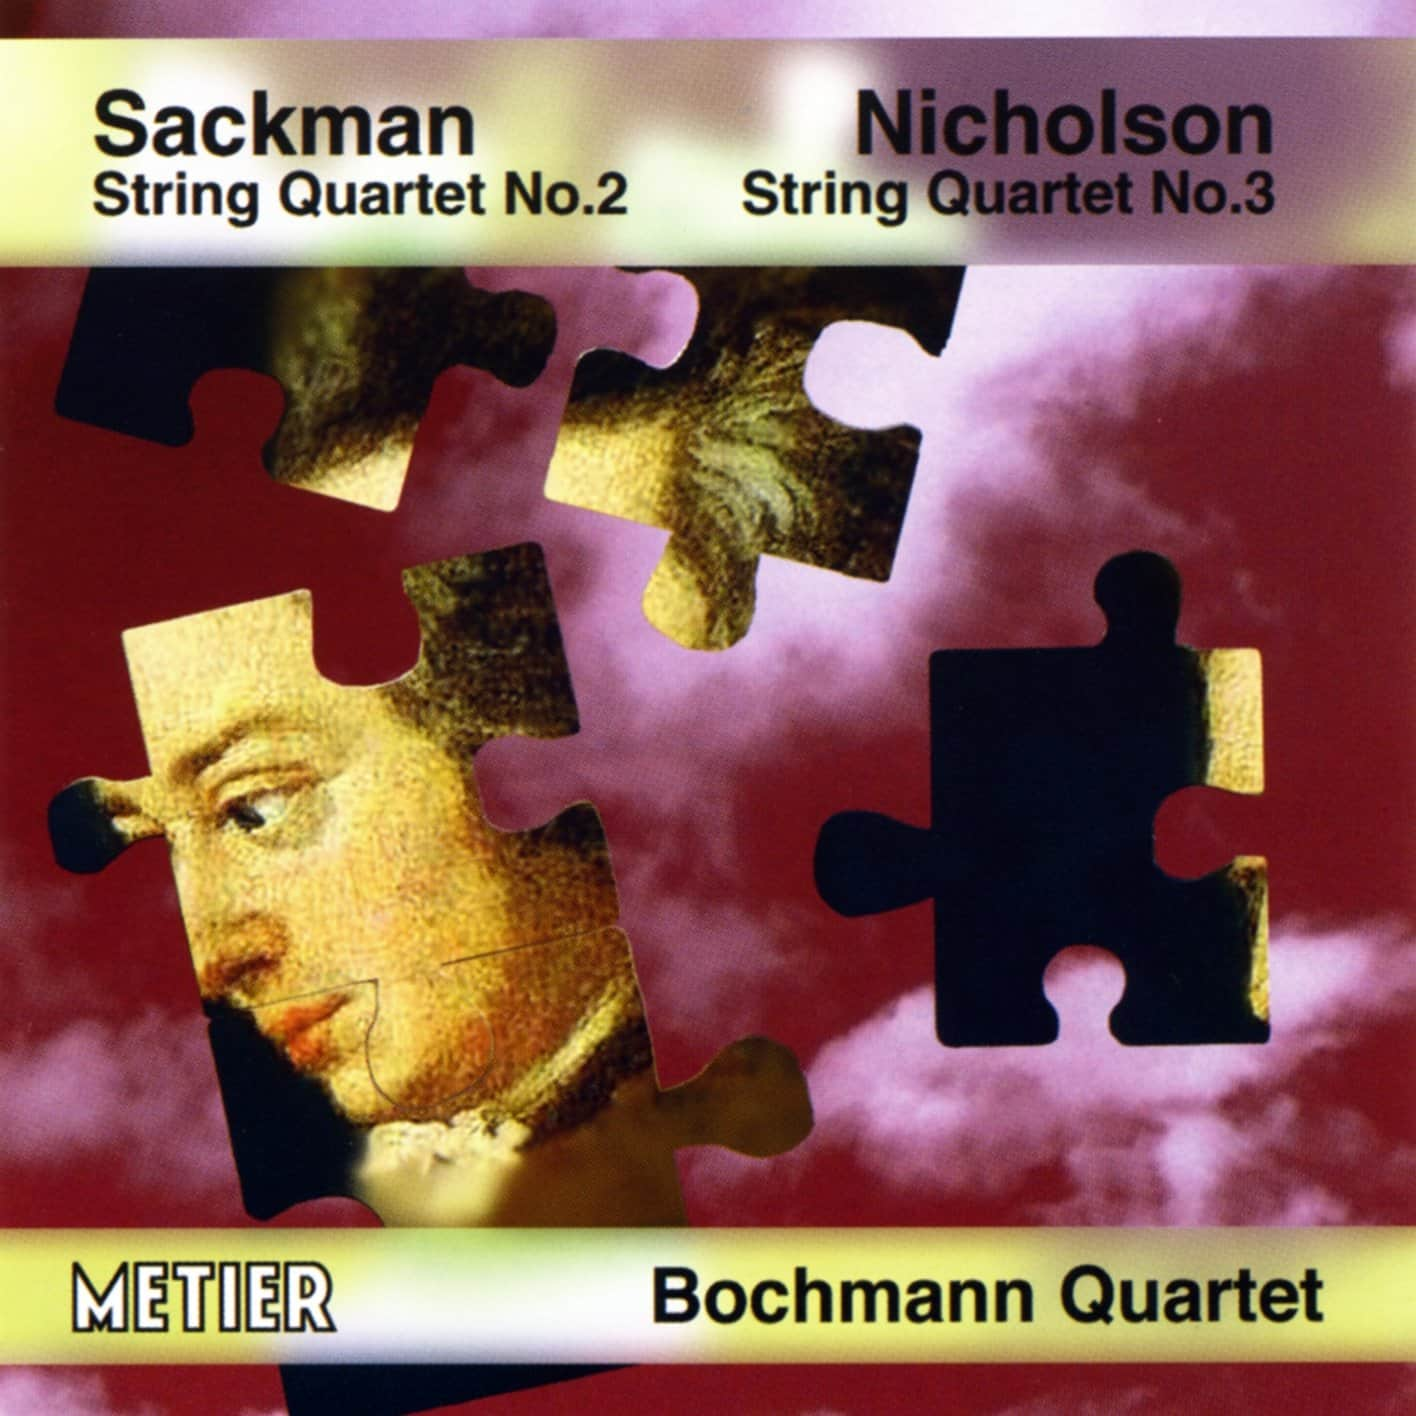 Sackman & Nicholson Quartets